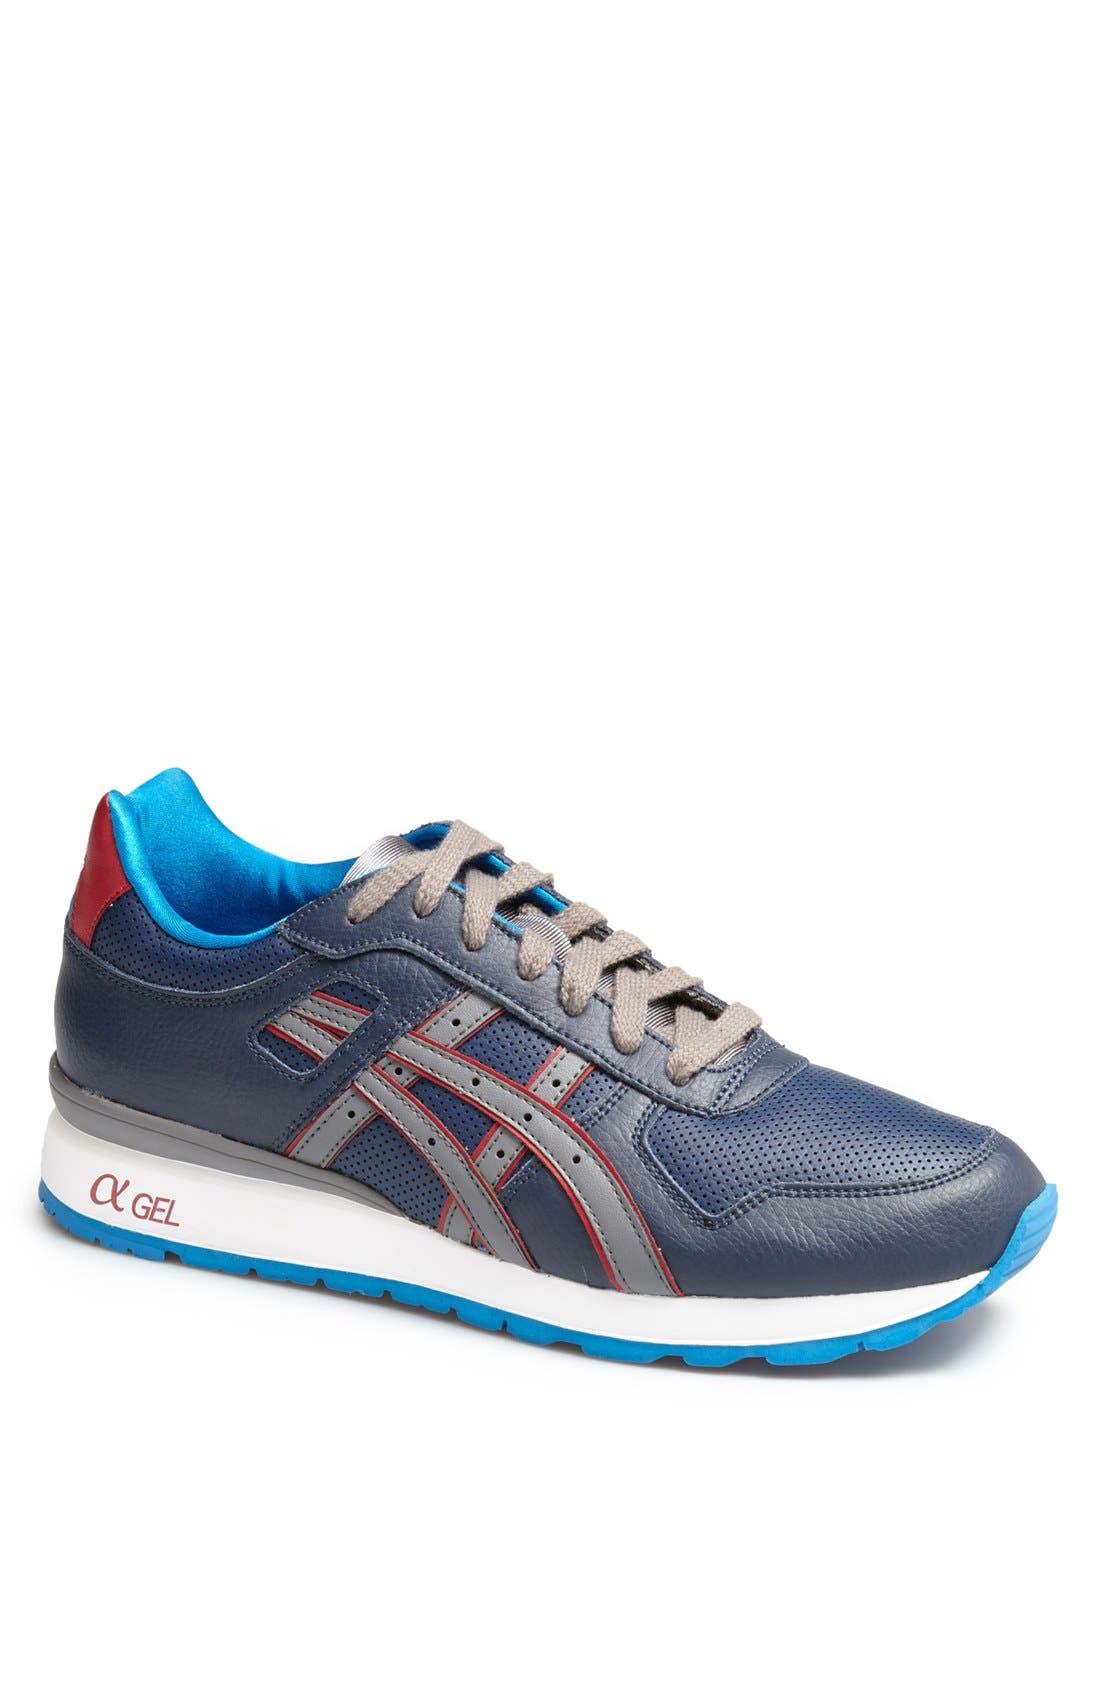 Alternate Image 1 Selected - ASICS® 'GT-II™' Sneaker (Men)